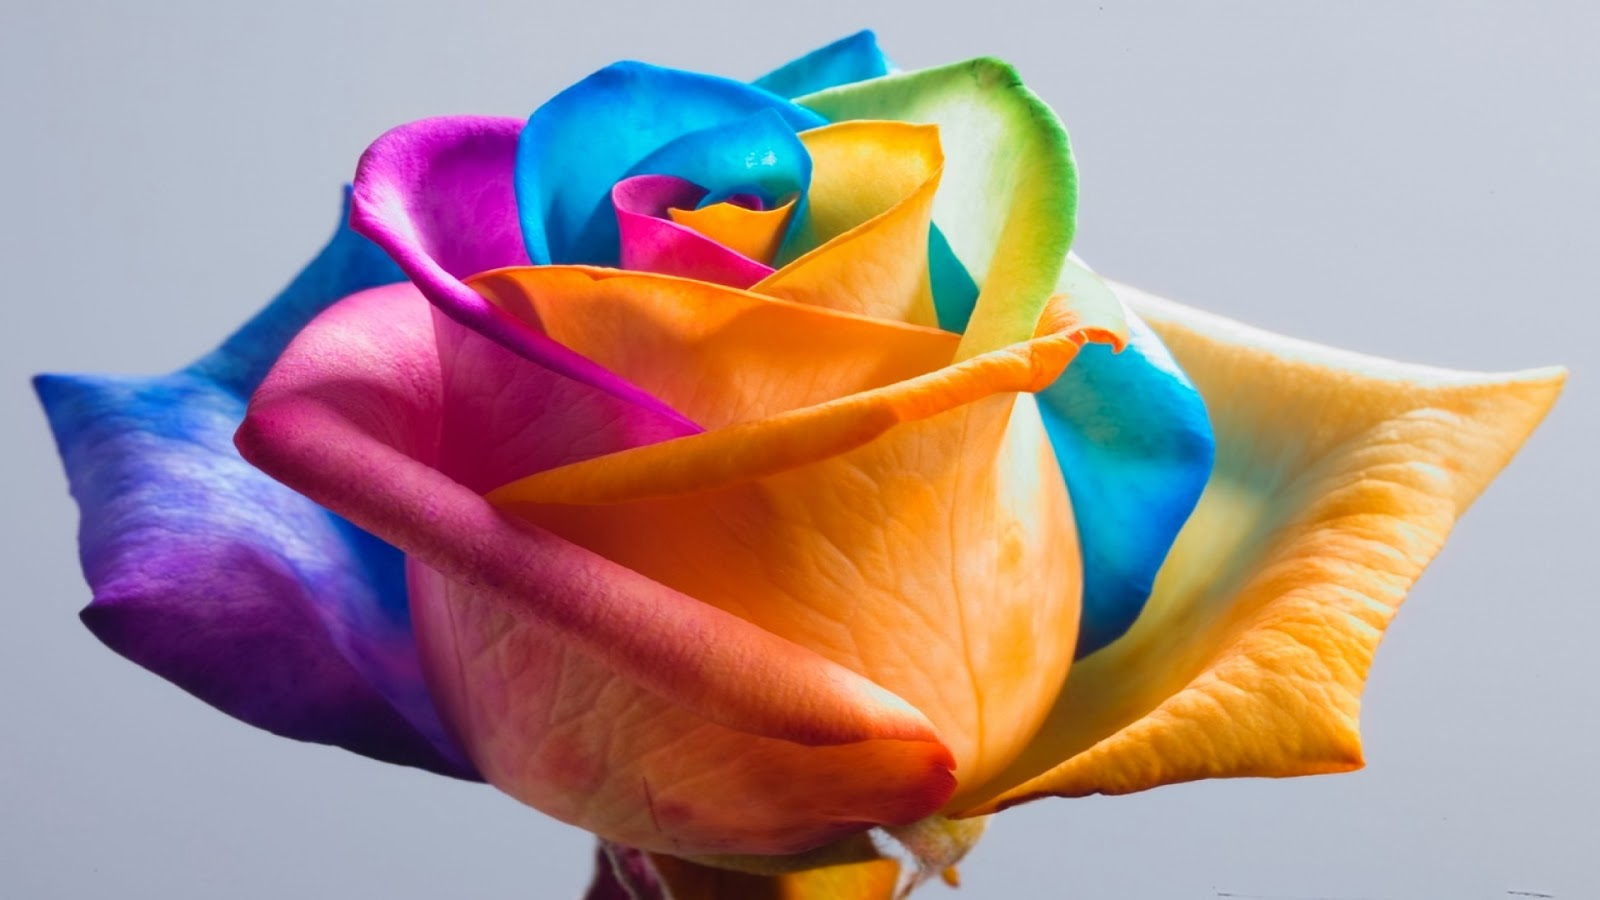 rainbow flower background - photo #18